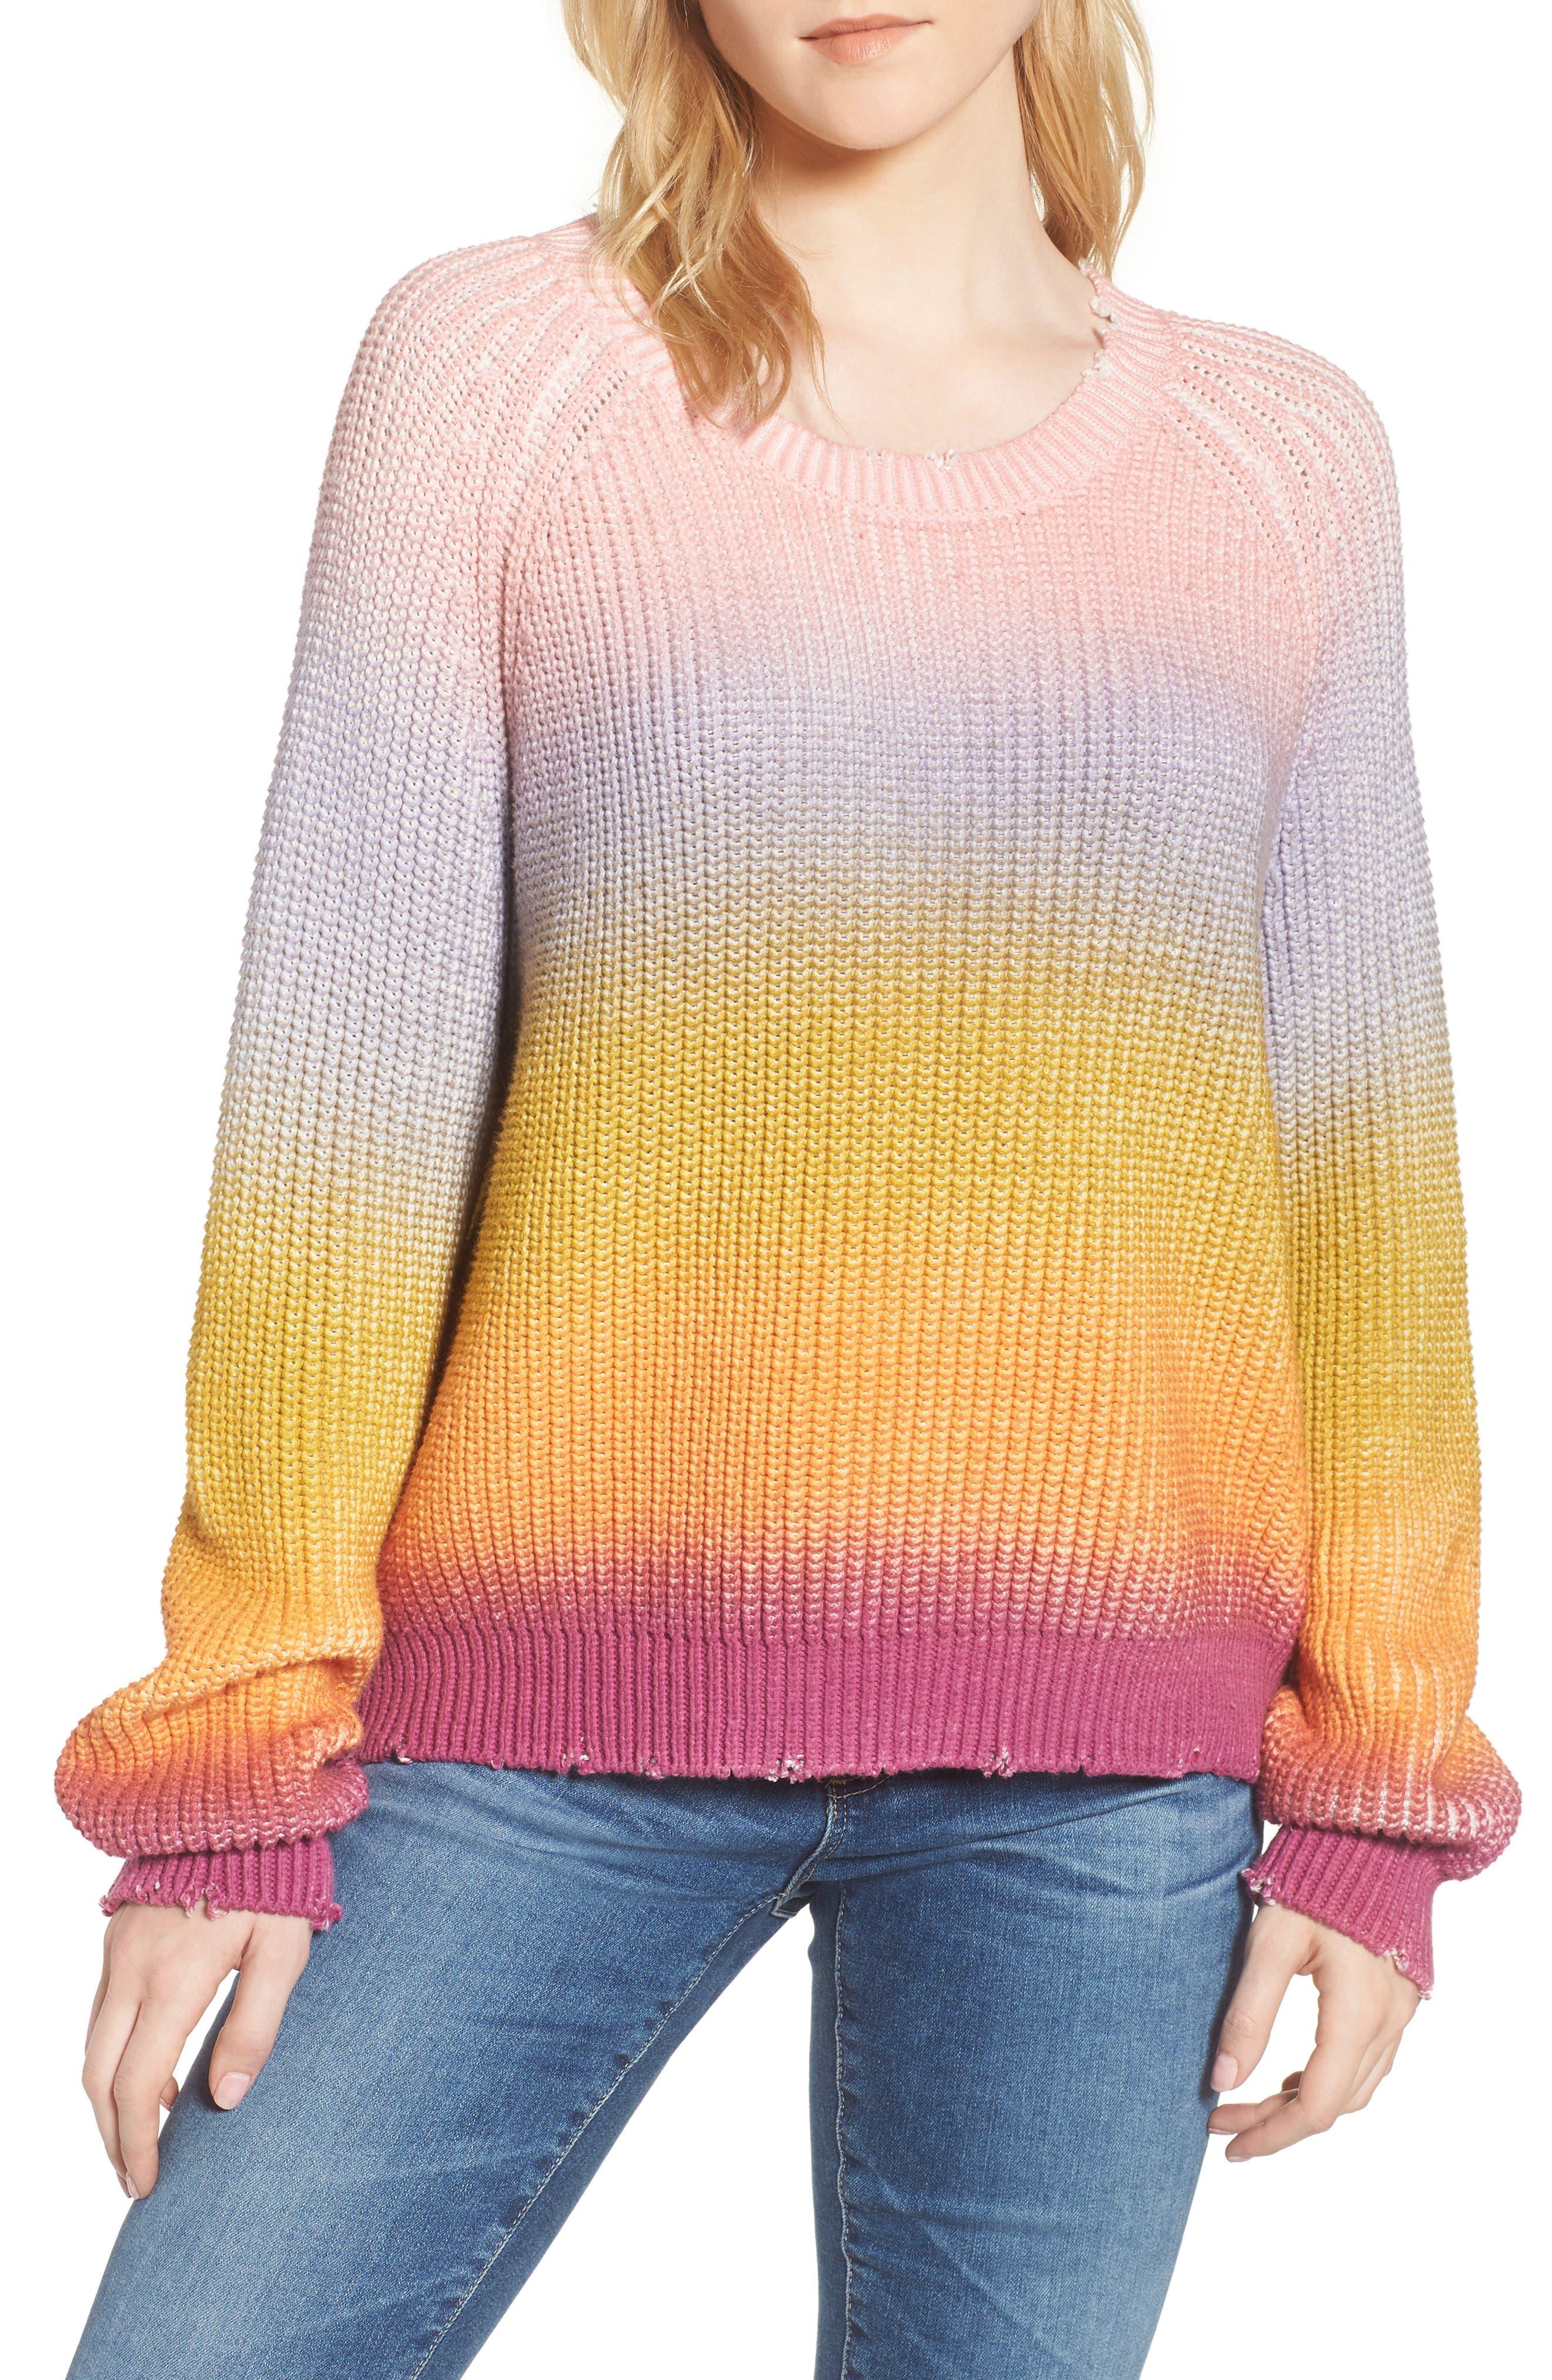 Kary Sweater,                             Main thumbnail 1, color,                             Multicolor